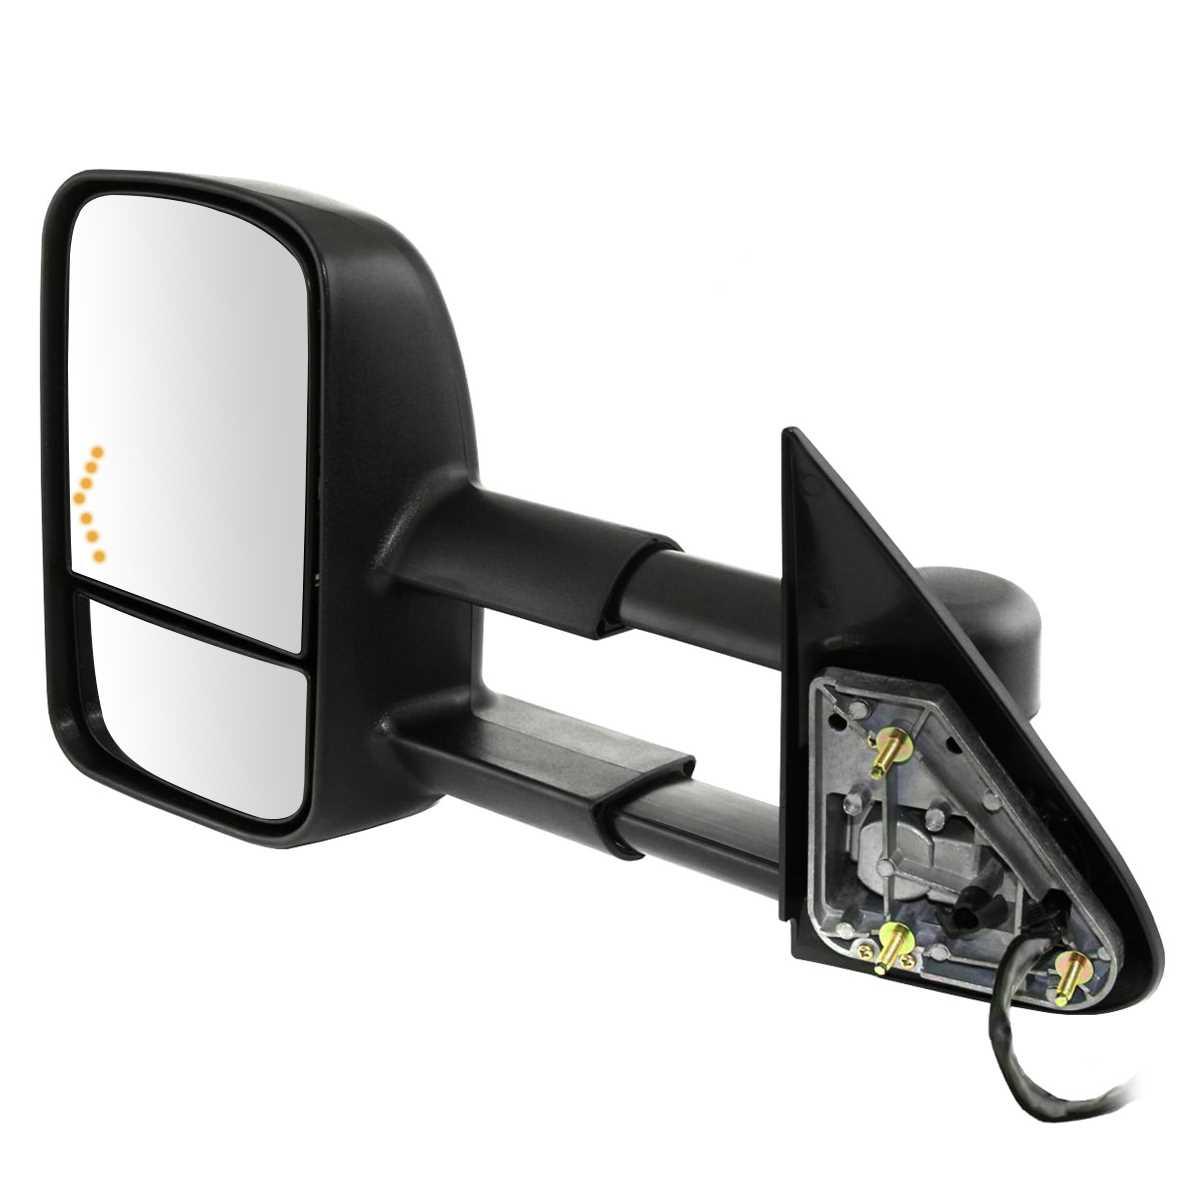 New-Pair-Power-Heated-Signal-Side-Mirror-Fits-2003-2006-Chevrolet-Silverado-1500 thumbnail 7